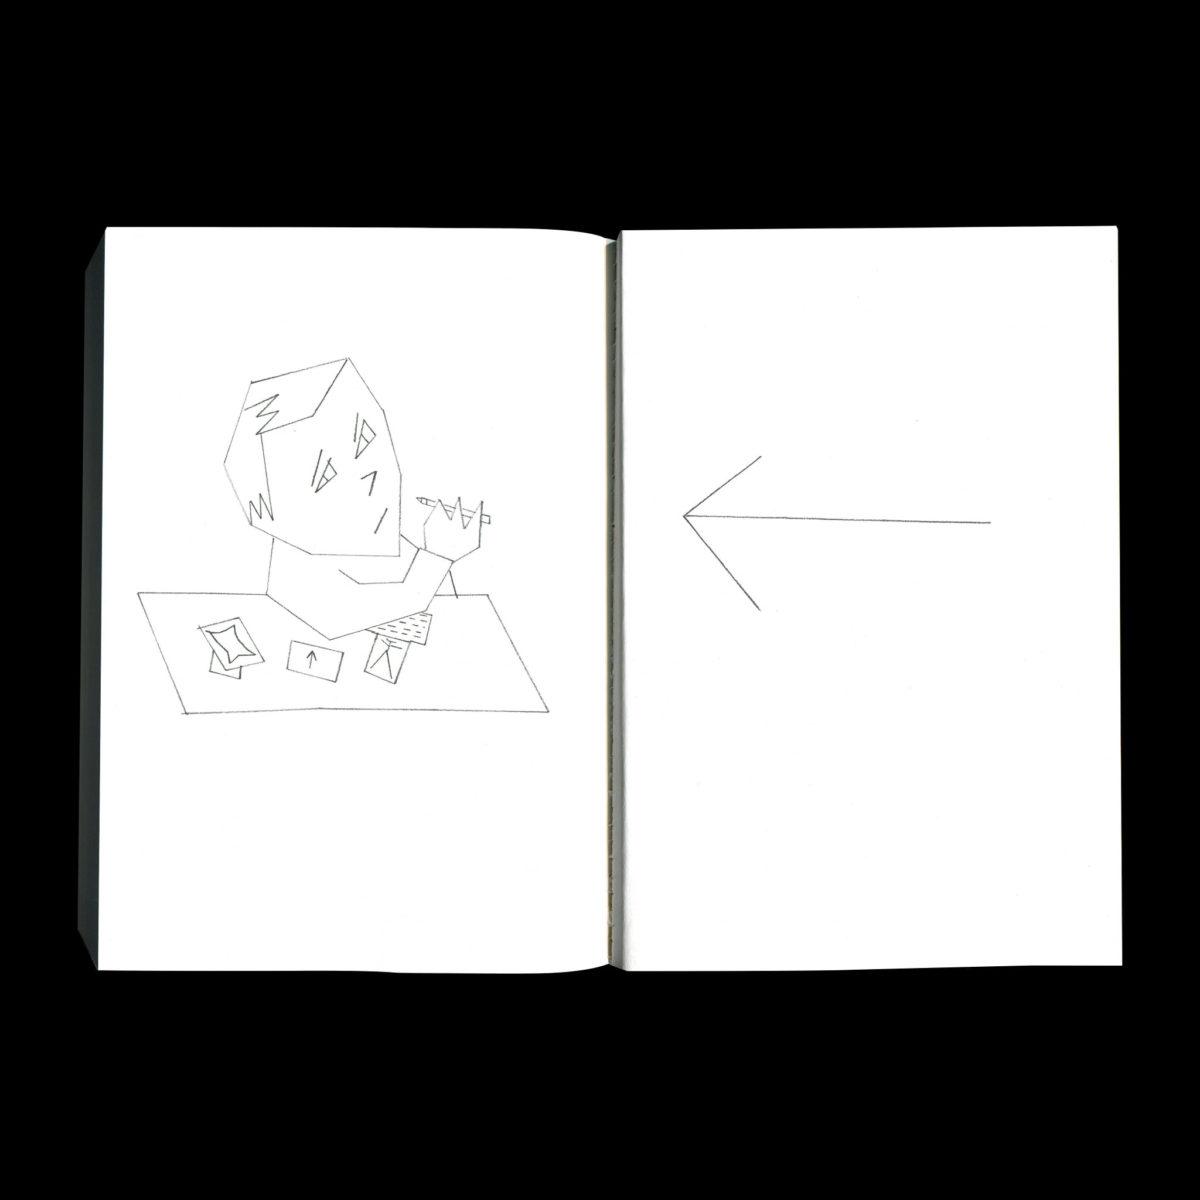 tim-colmant-exercices-de-dessin-01_2